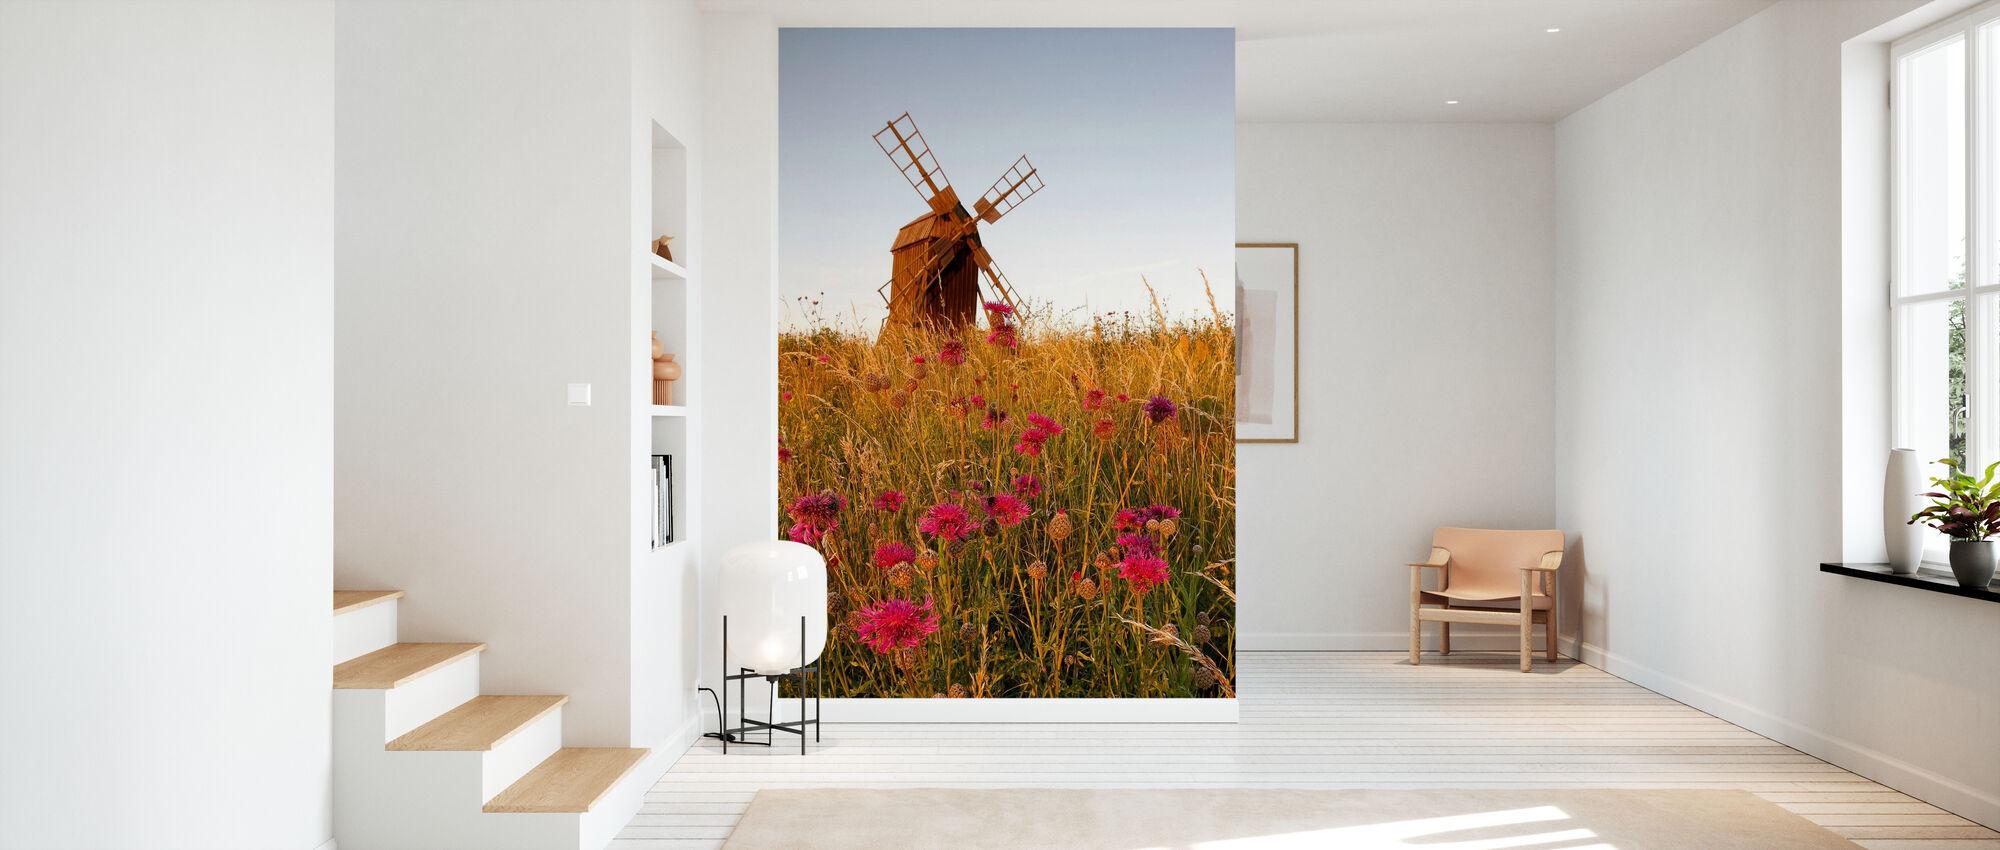 Grainy Windmill - Wallpaper - Hallway